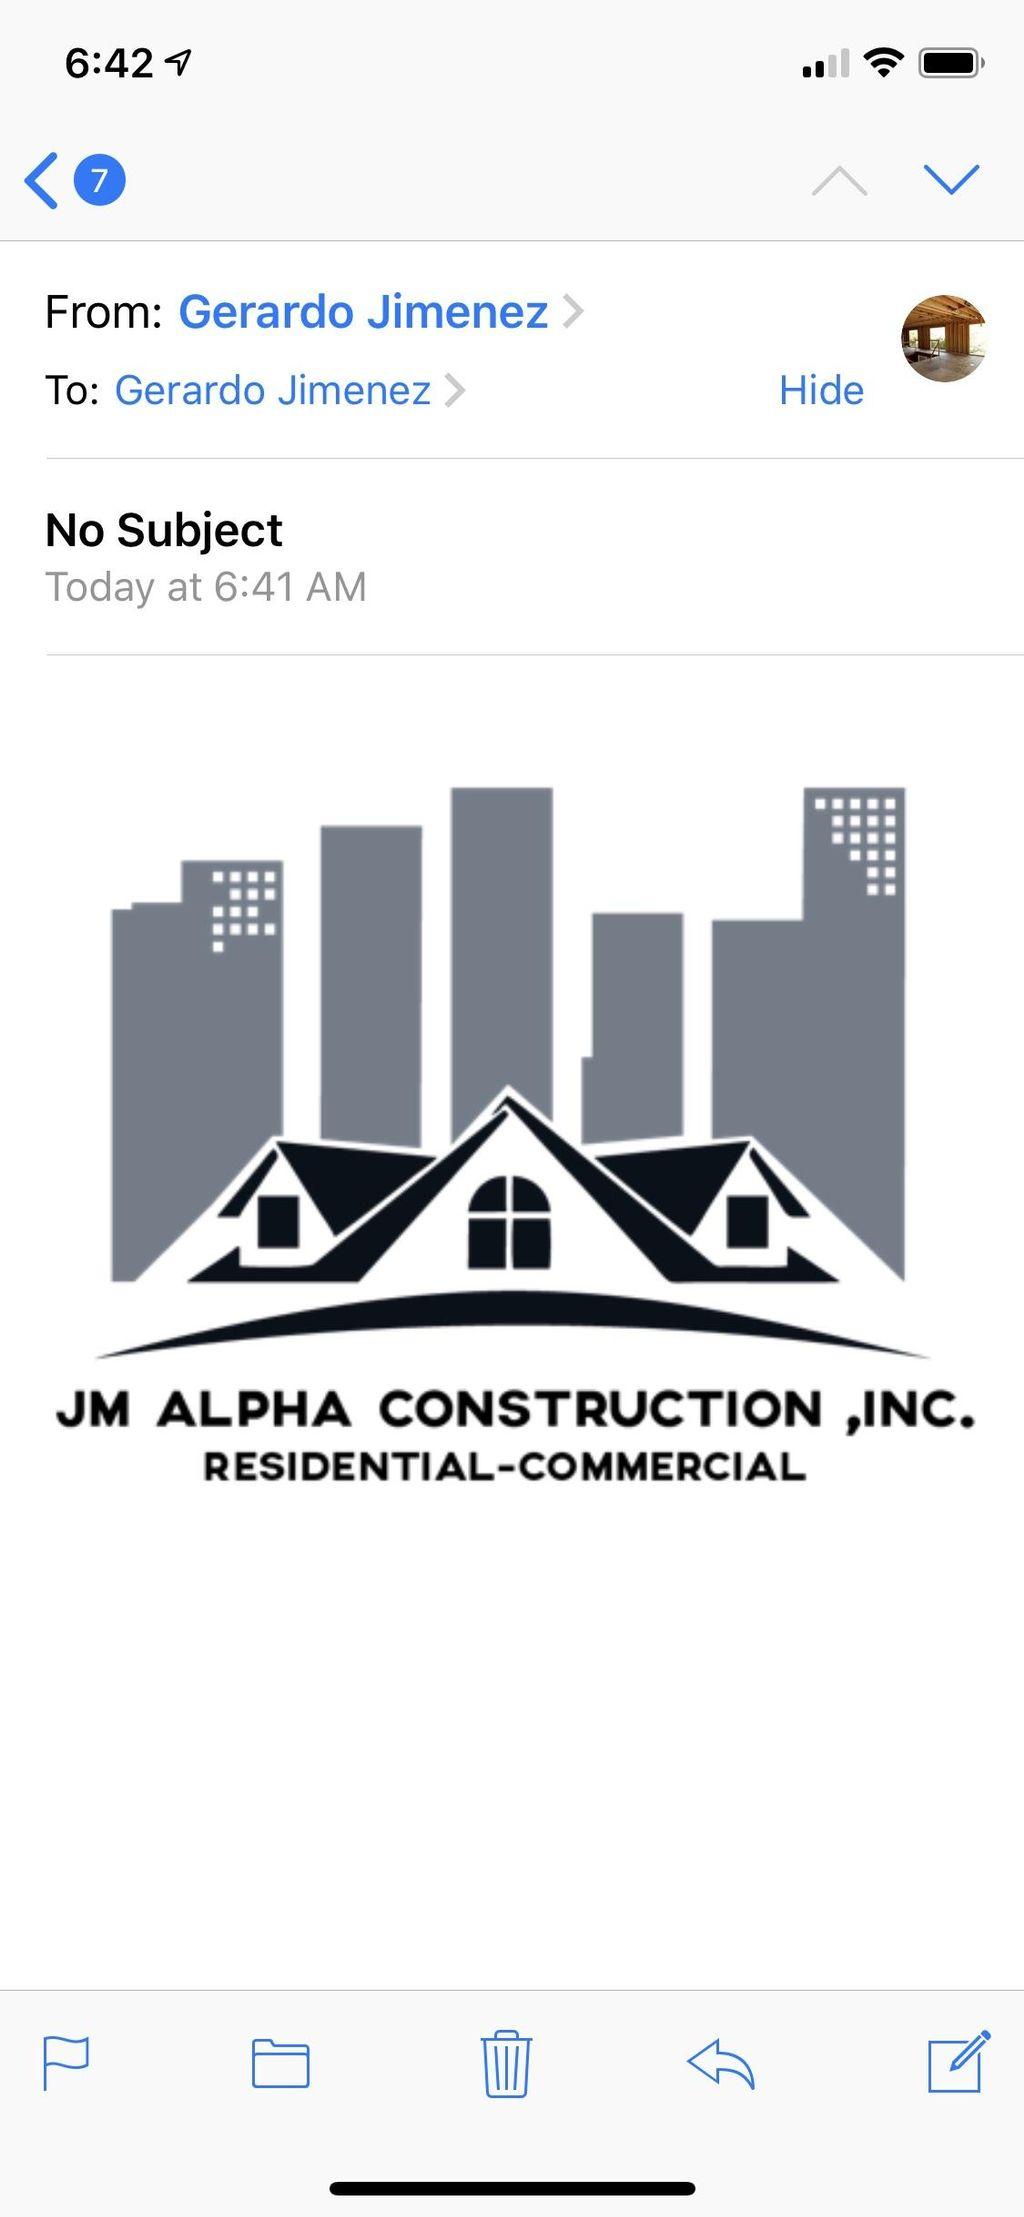 Jm Alpha Construction Inc